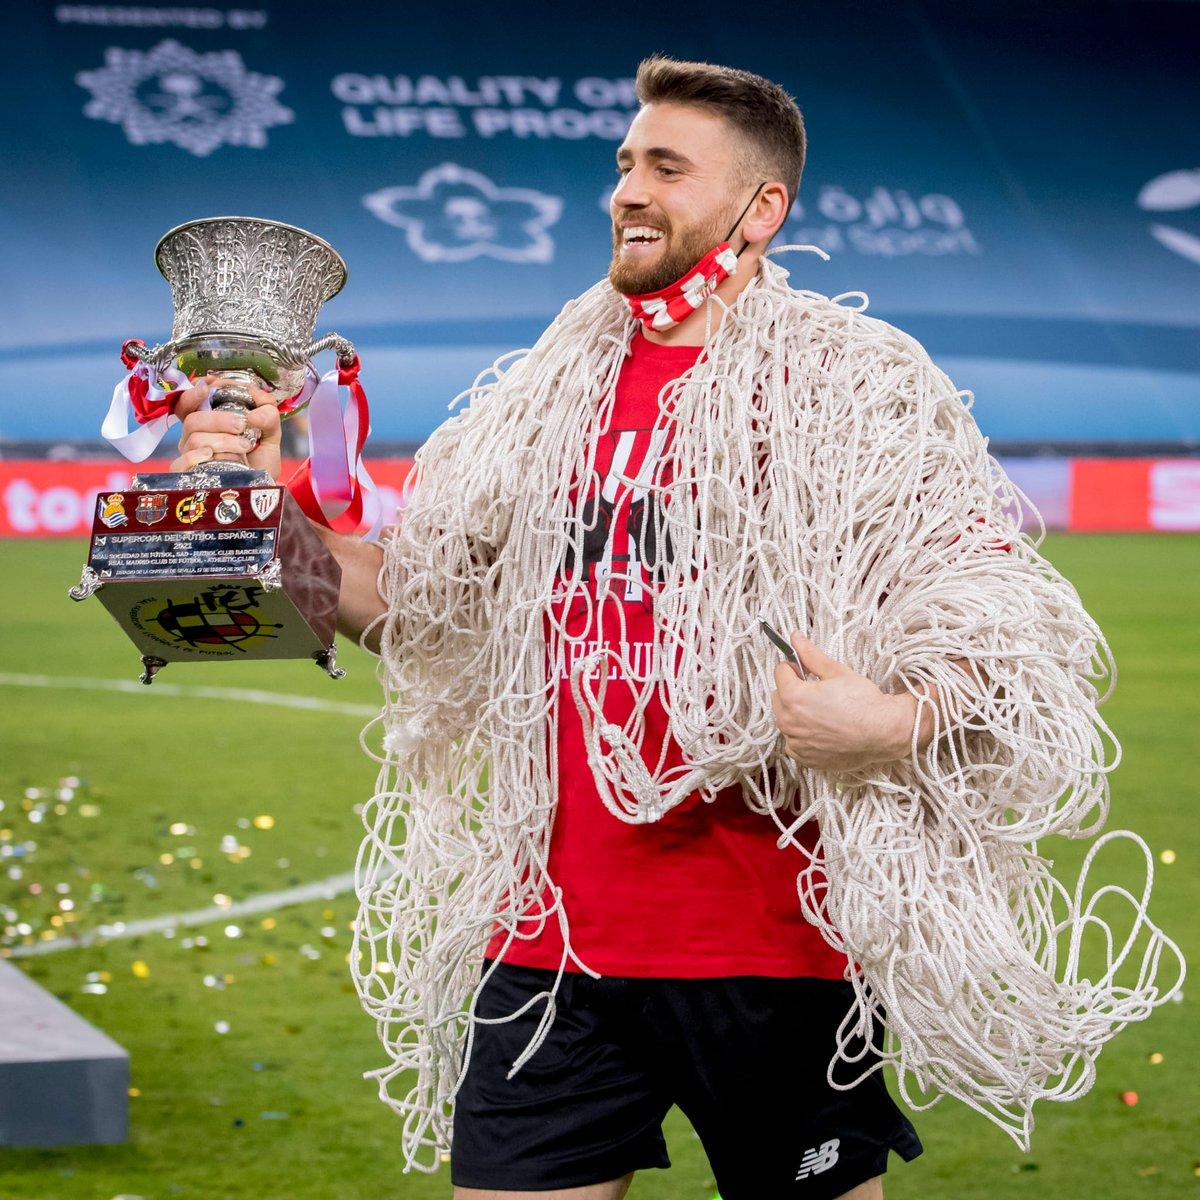 🏆🏆🏆 #Supercopa   𝗨𝗻𝗮𝗶 𝗦𝗶𝗺𝗼́𝗻 🔝  #DenonAmetsa 🔴⚪ #BiziAmetsa  #AthleticClub 🦁